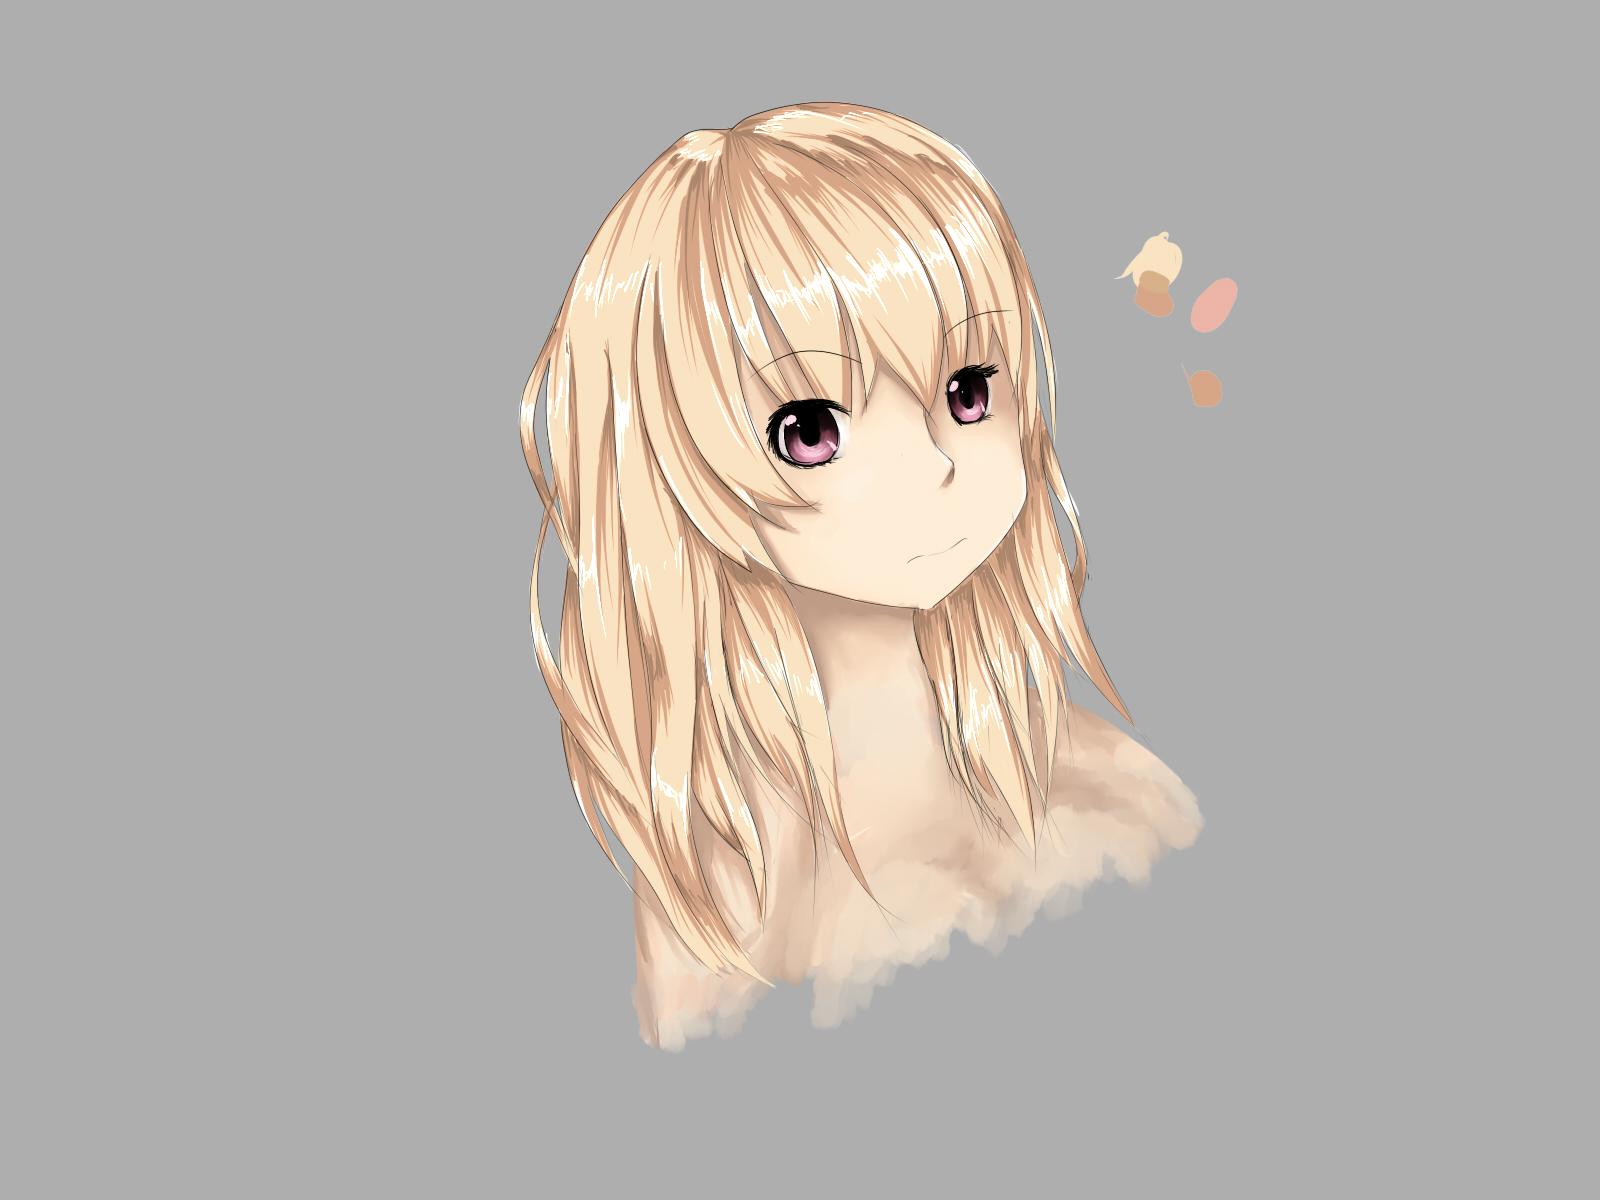 anime blonde hair best image of blonde hair 2018